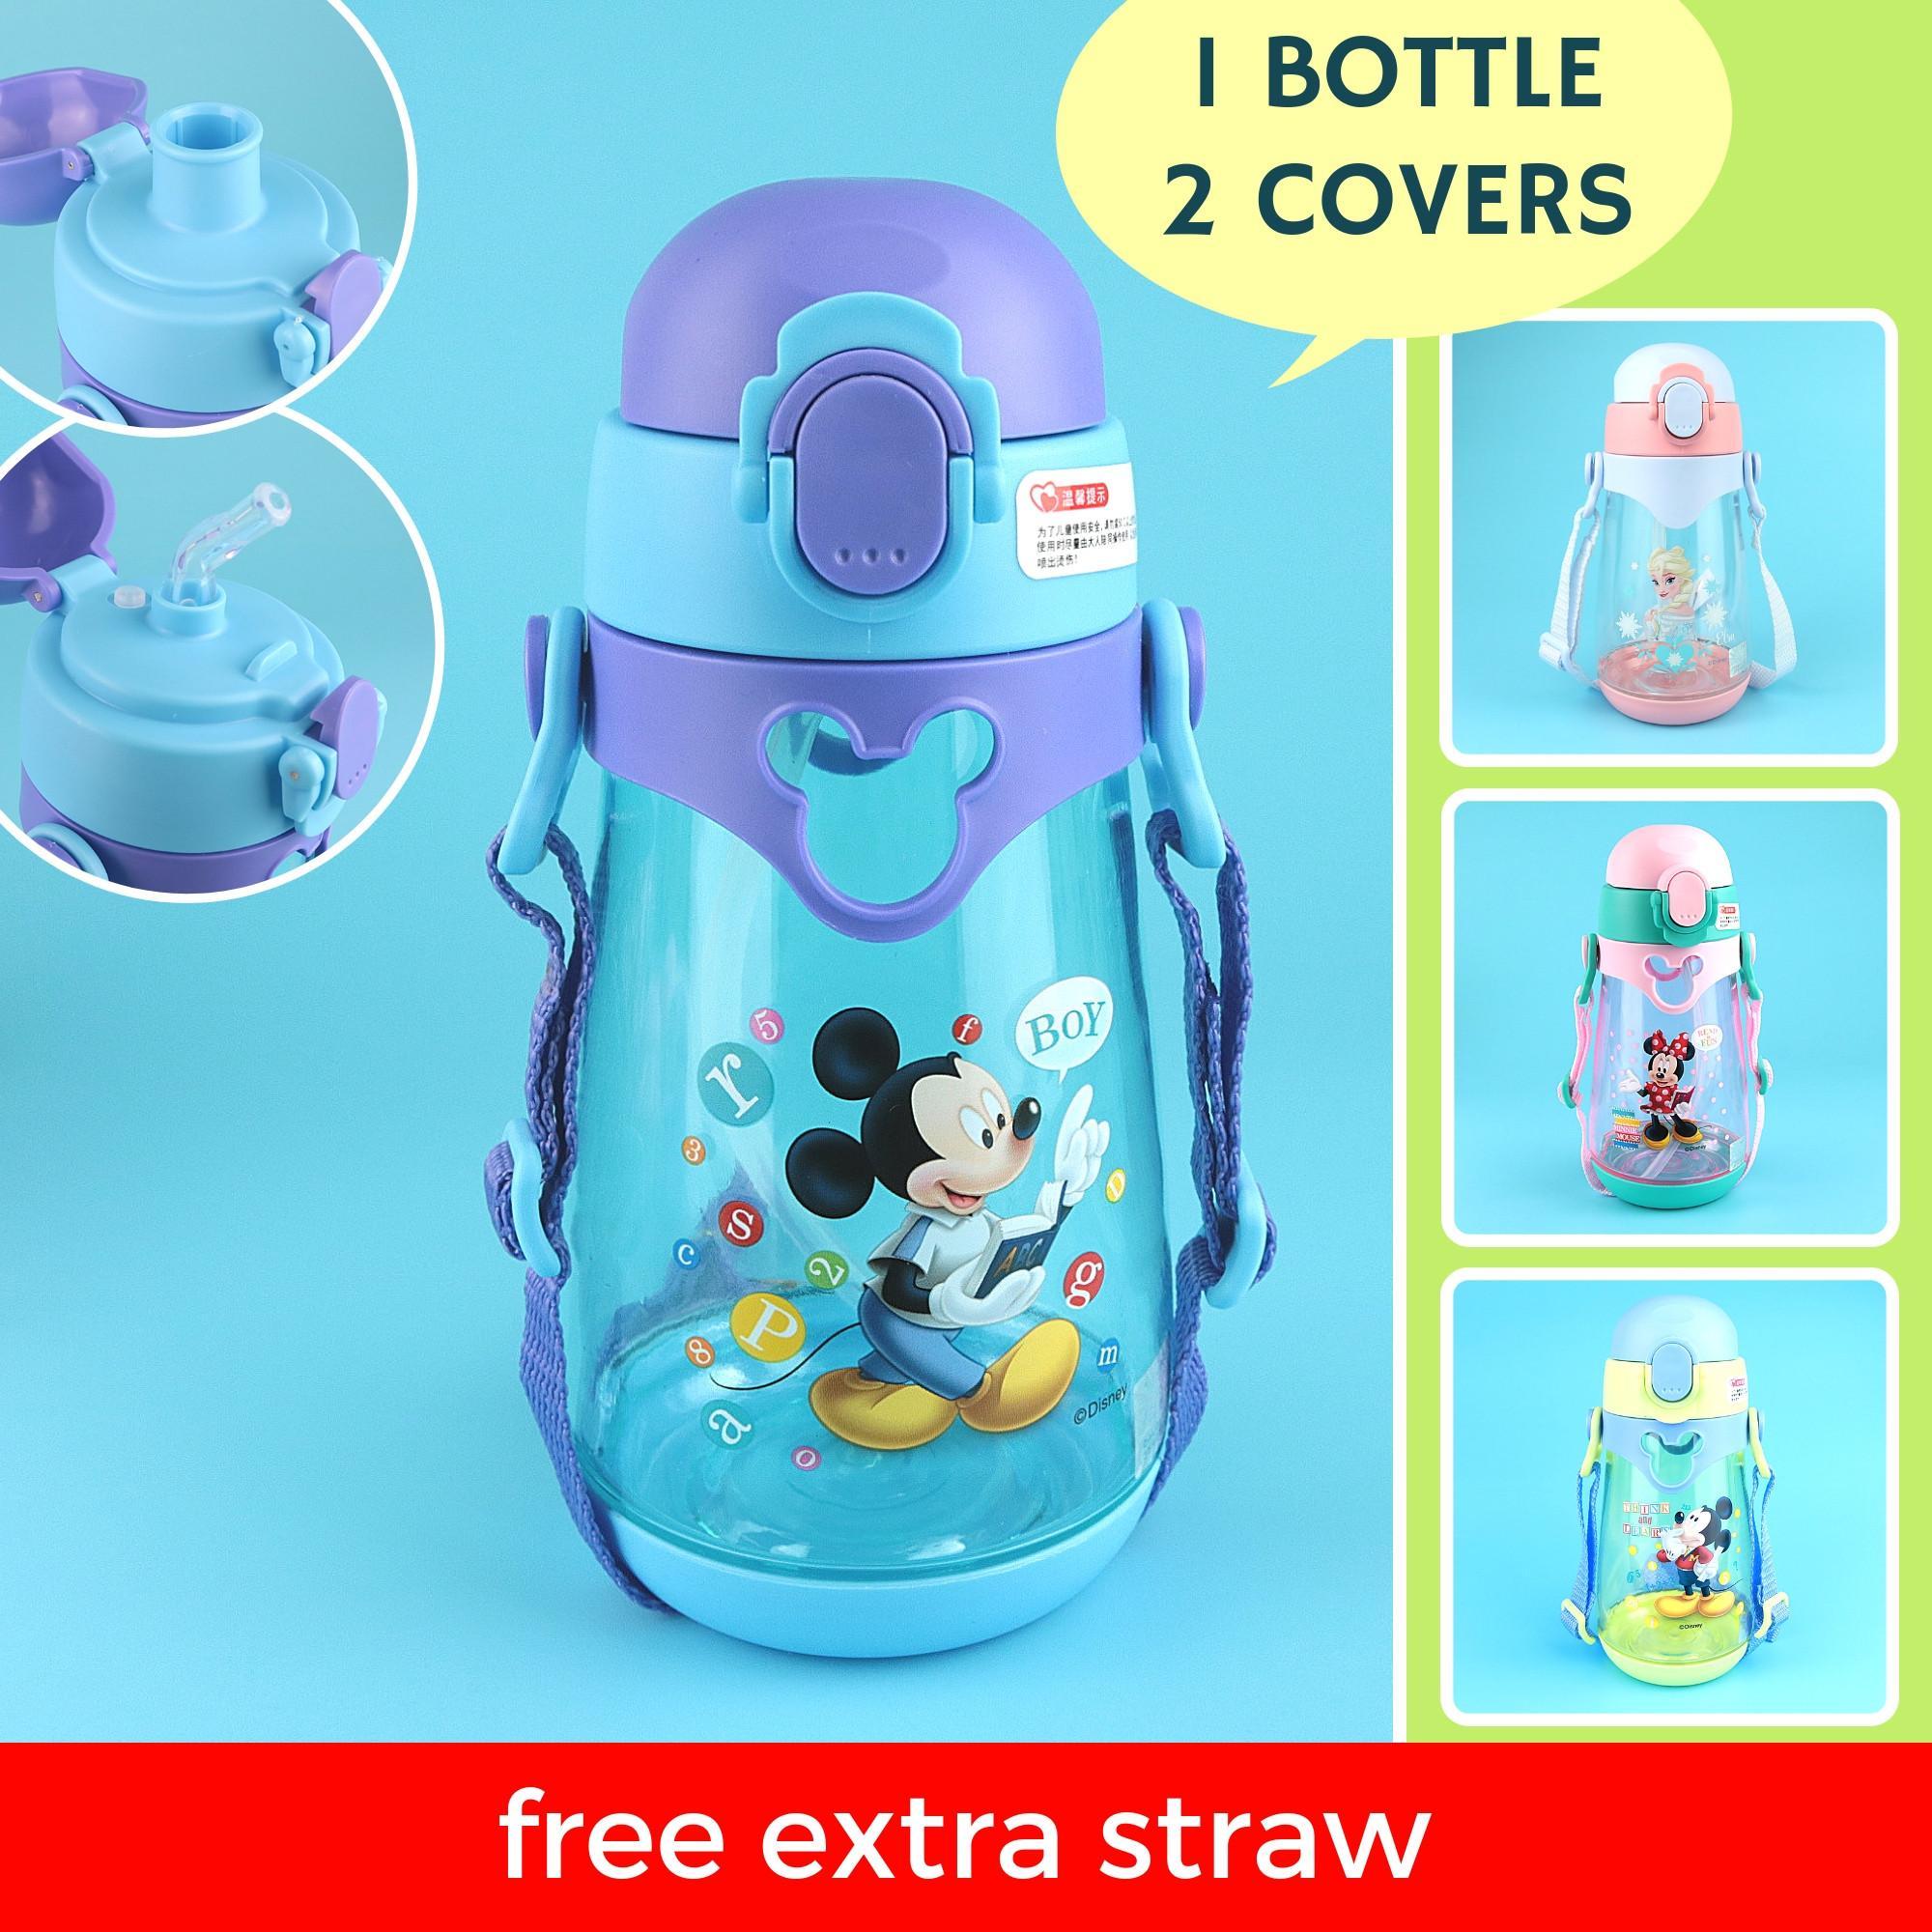 Disney Frozen Kids Water Bottle 2-In-1 Straw And Direct Drink Interchangeable Bpa-Free 550ml By 8miles Creative Studio.